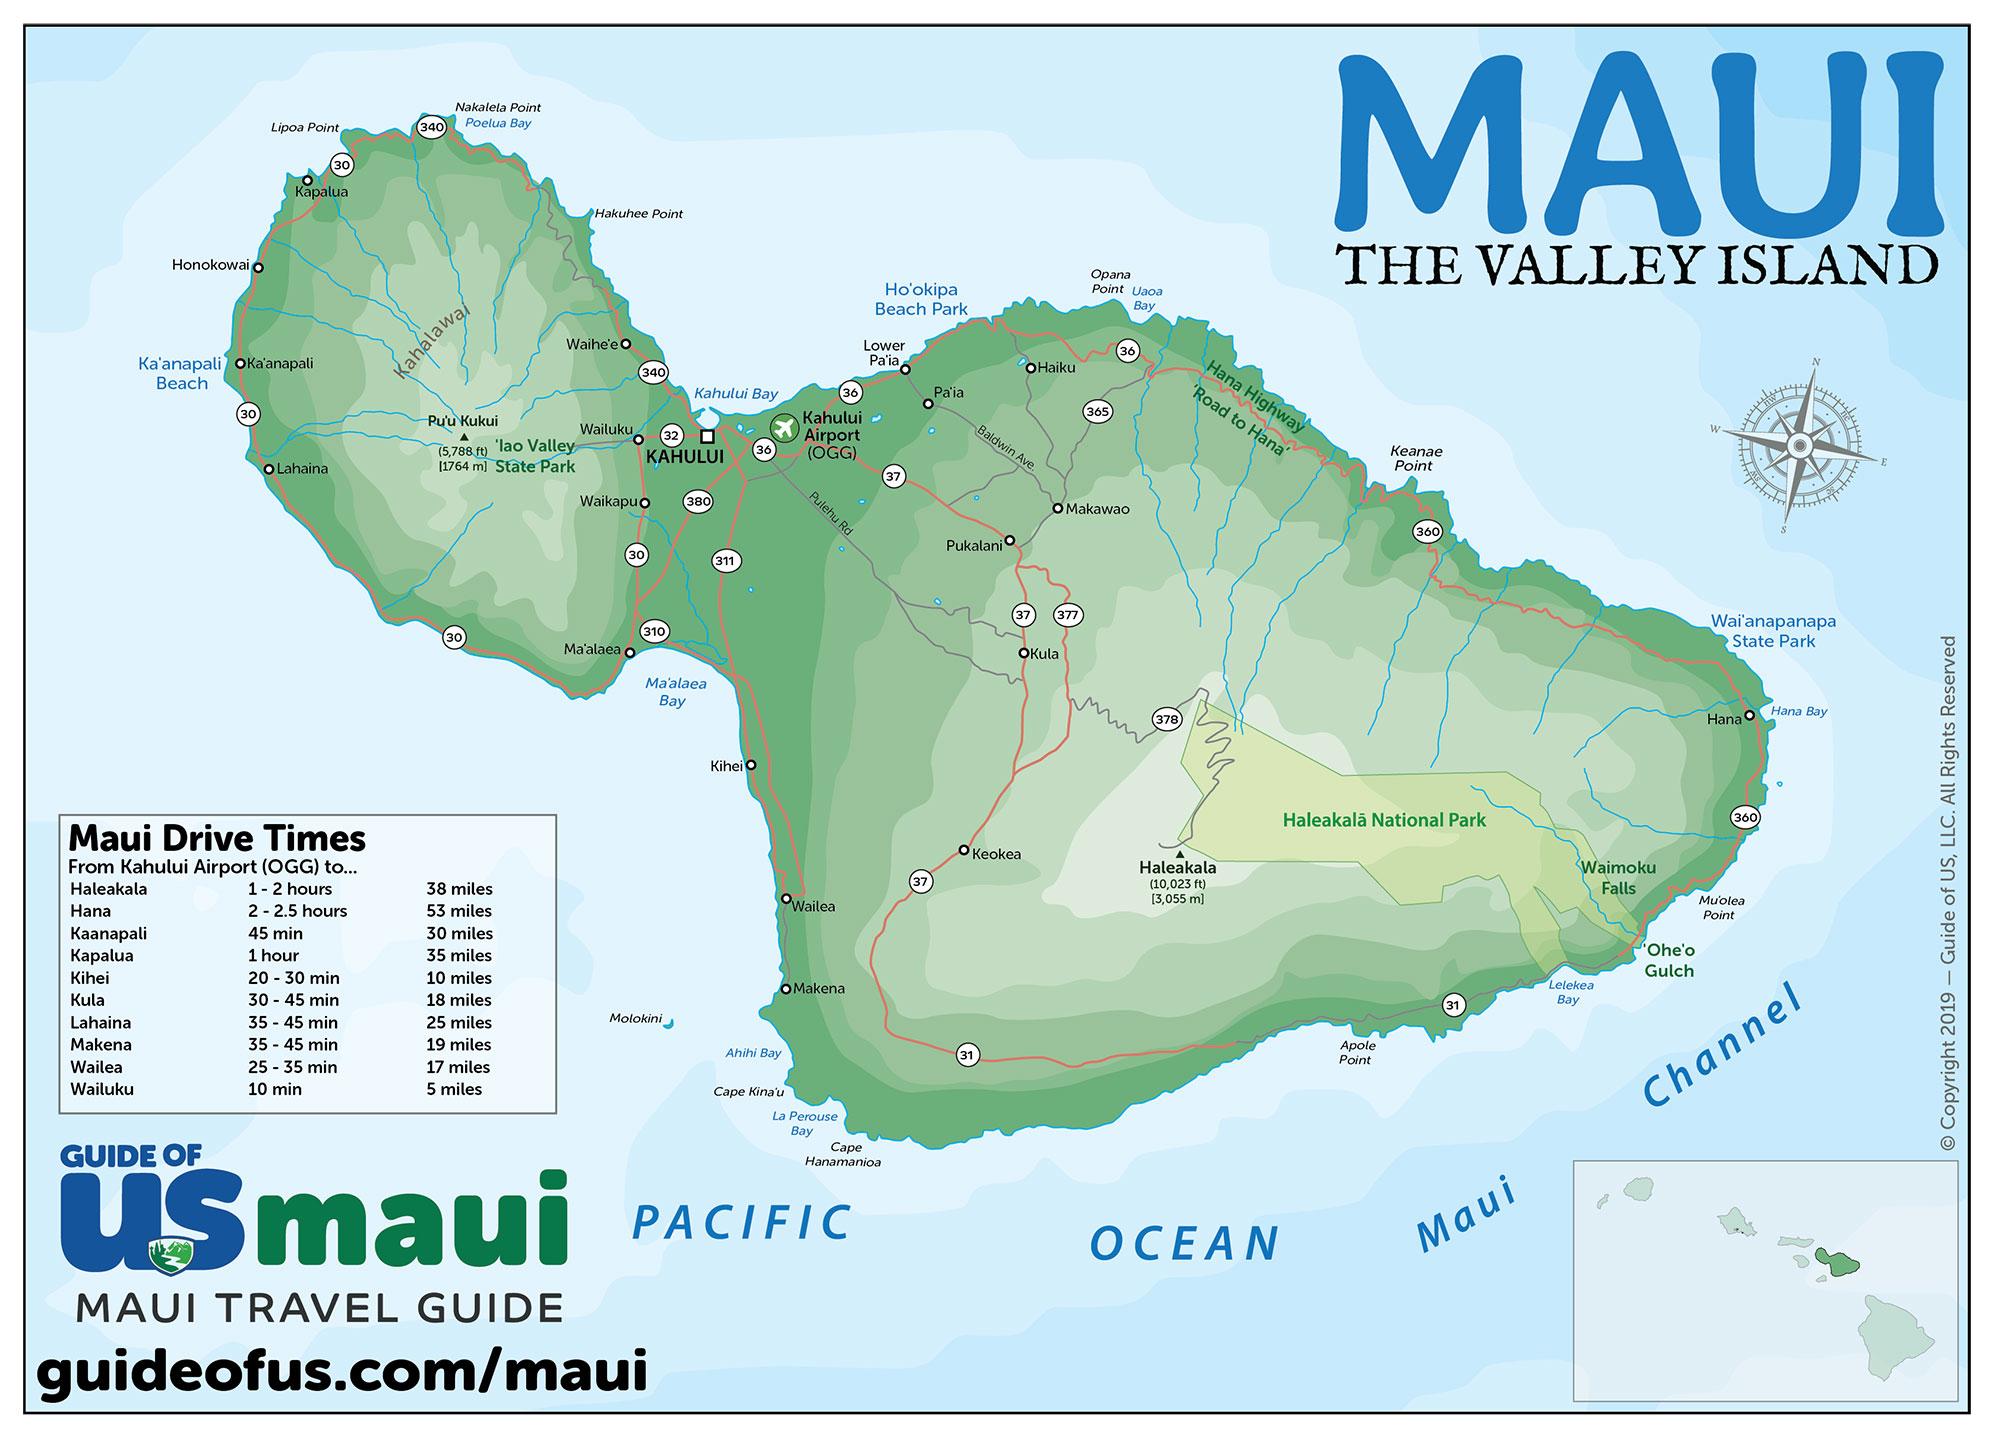 Maui Hawaii Maps - Travel Road Map